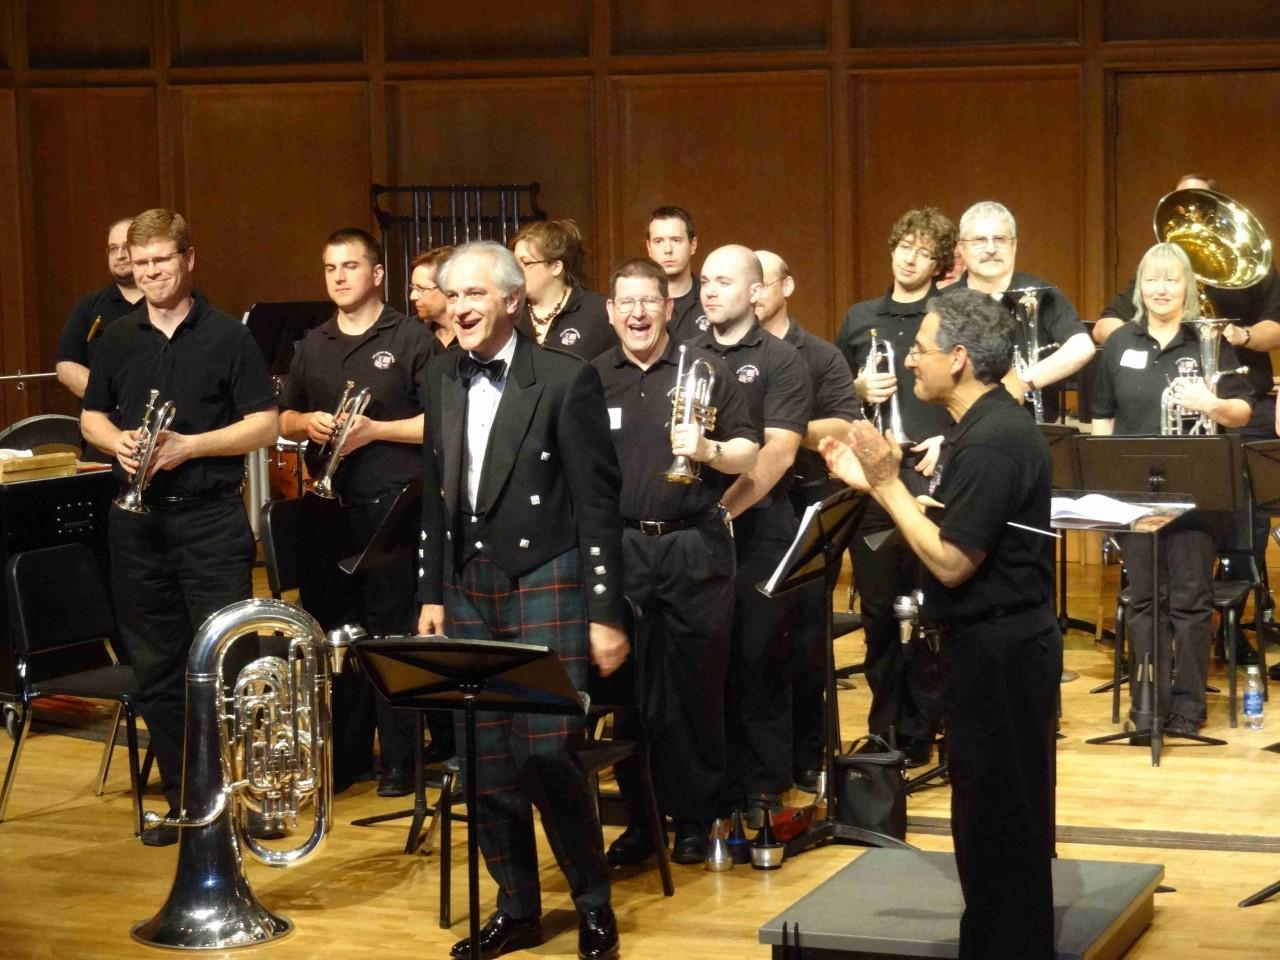 Tuba Concerto by Martin Ellerby.  Atlantic Brass Band, Dr. James Gourlay, soloist.